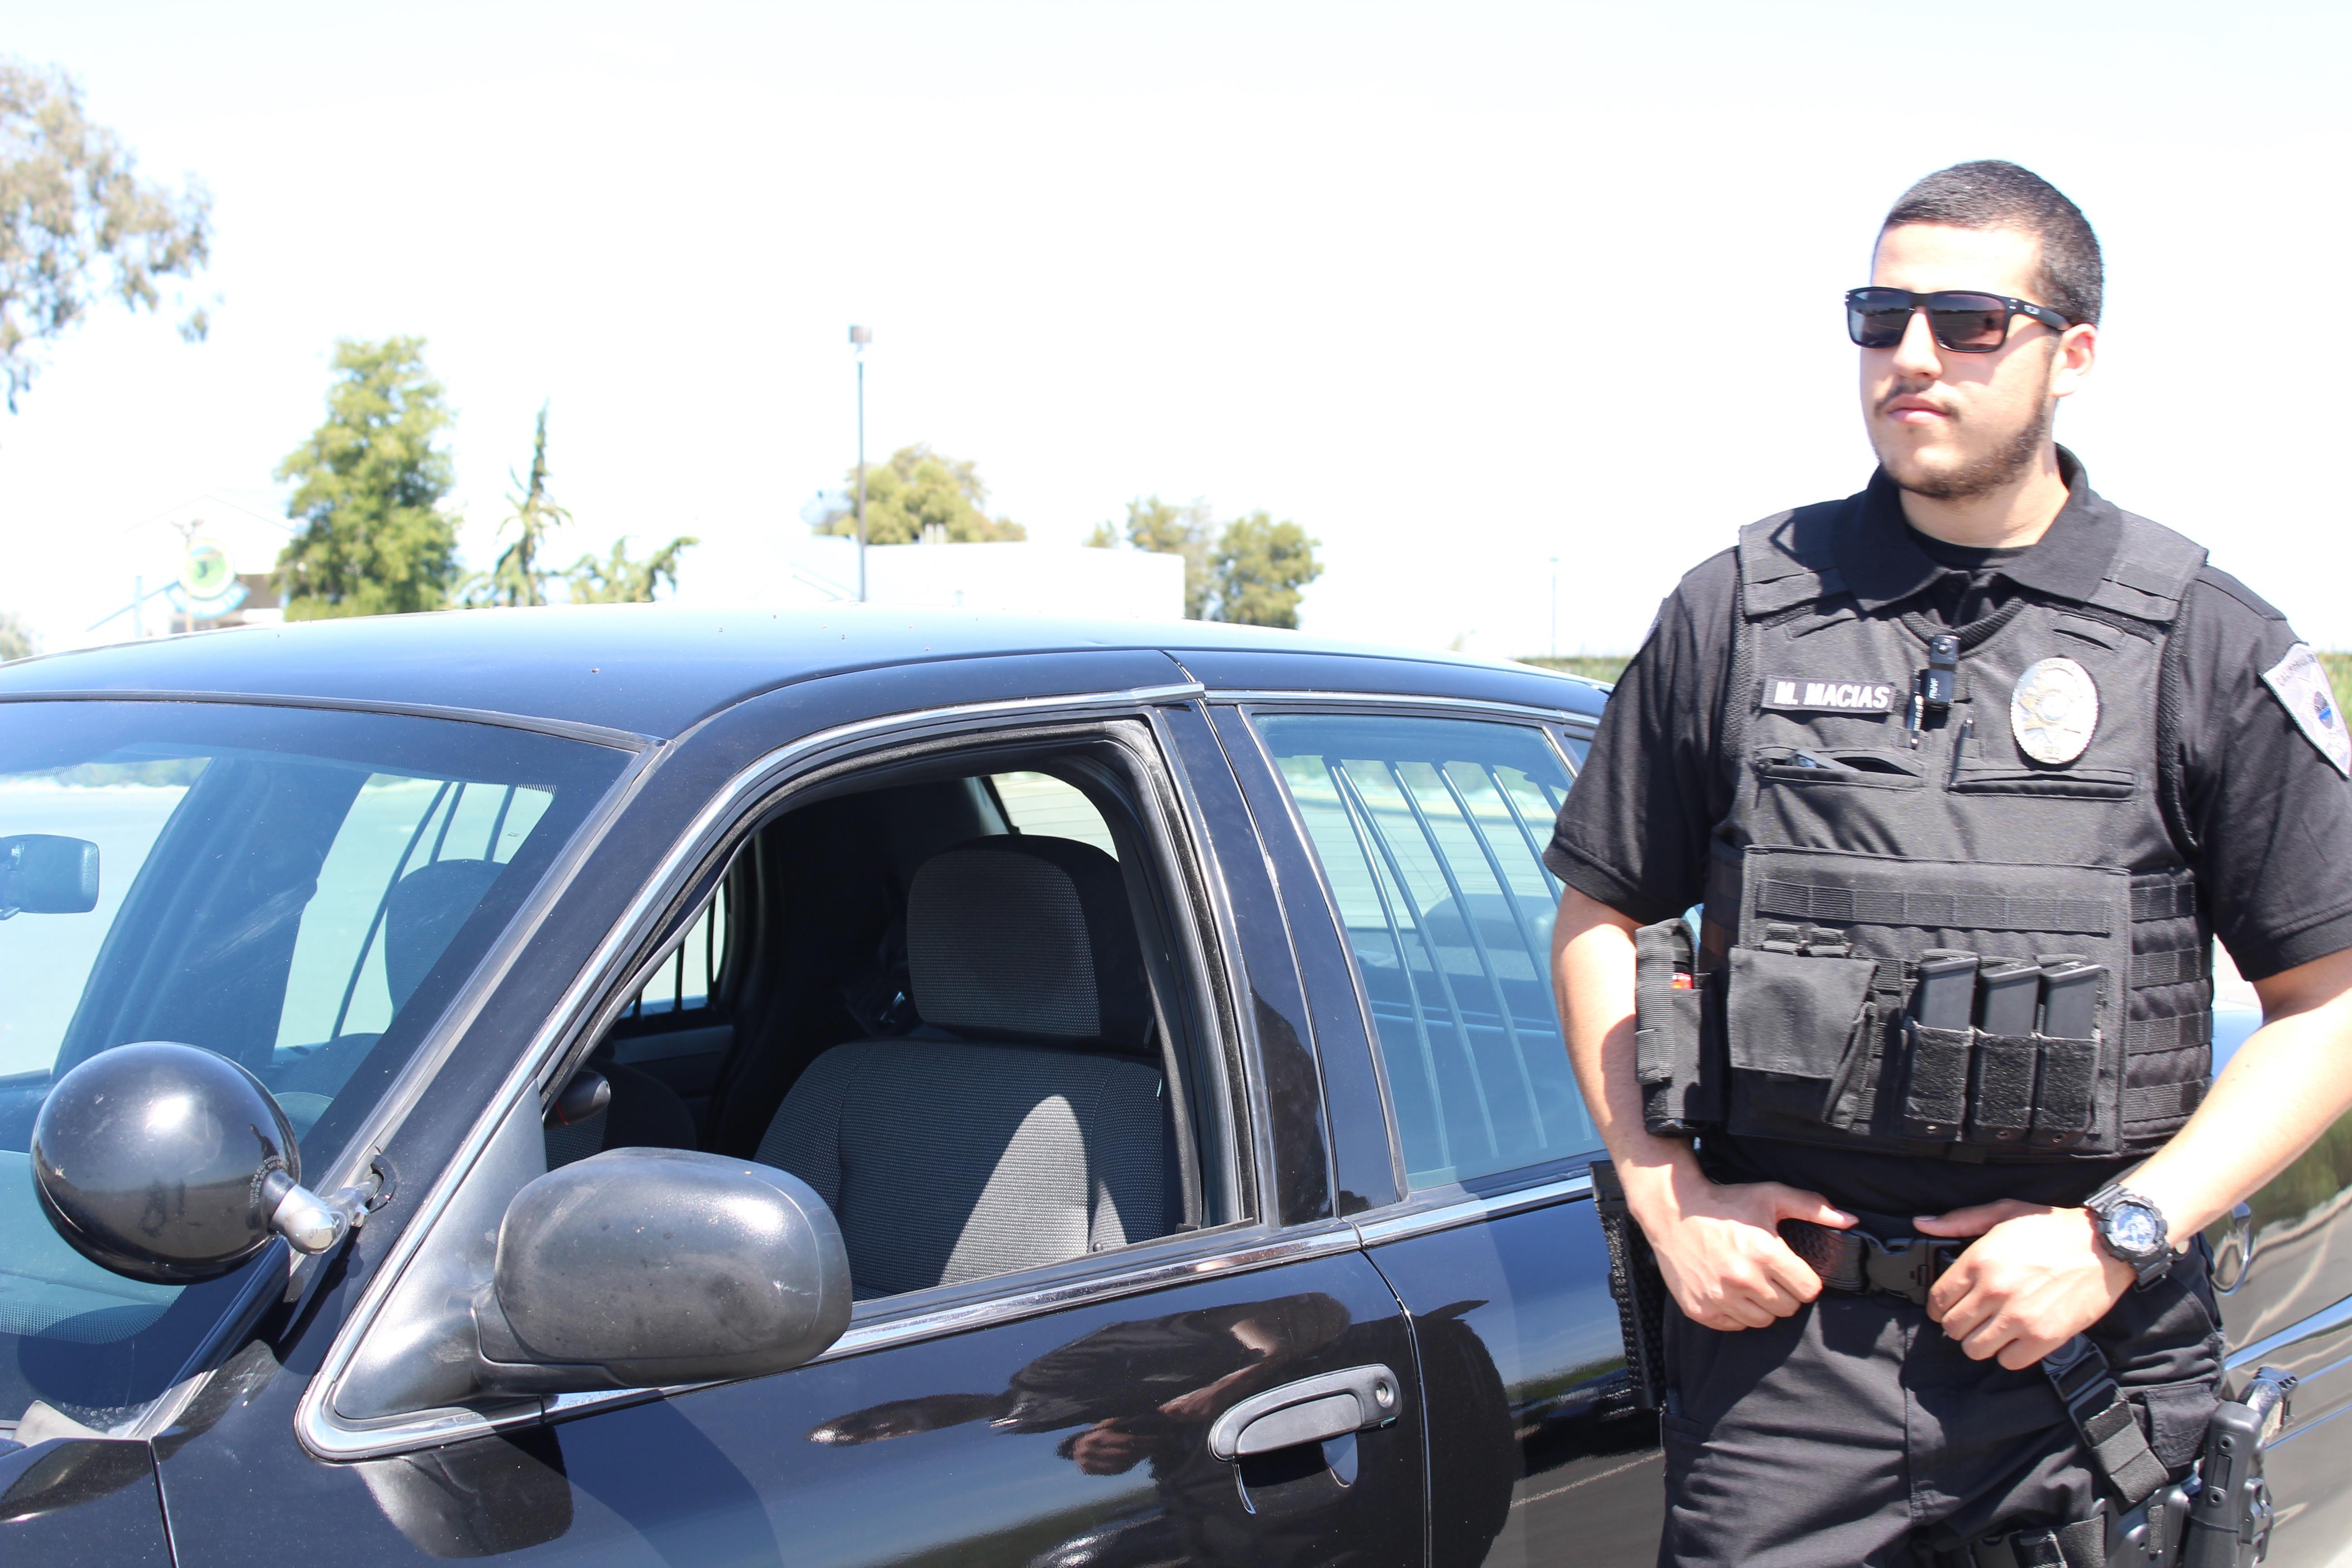 Security Patrol